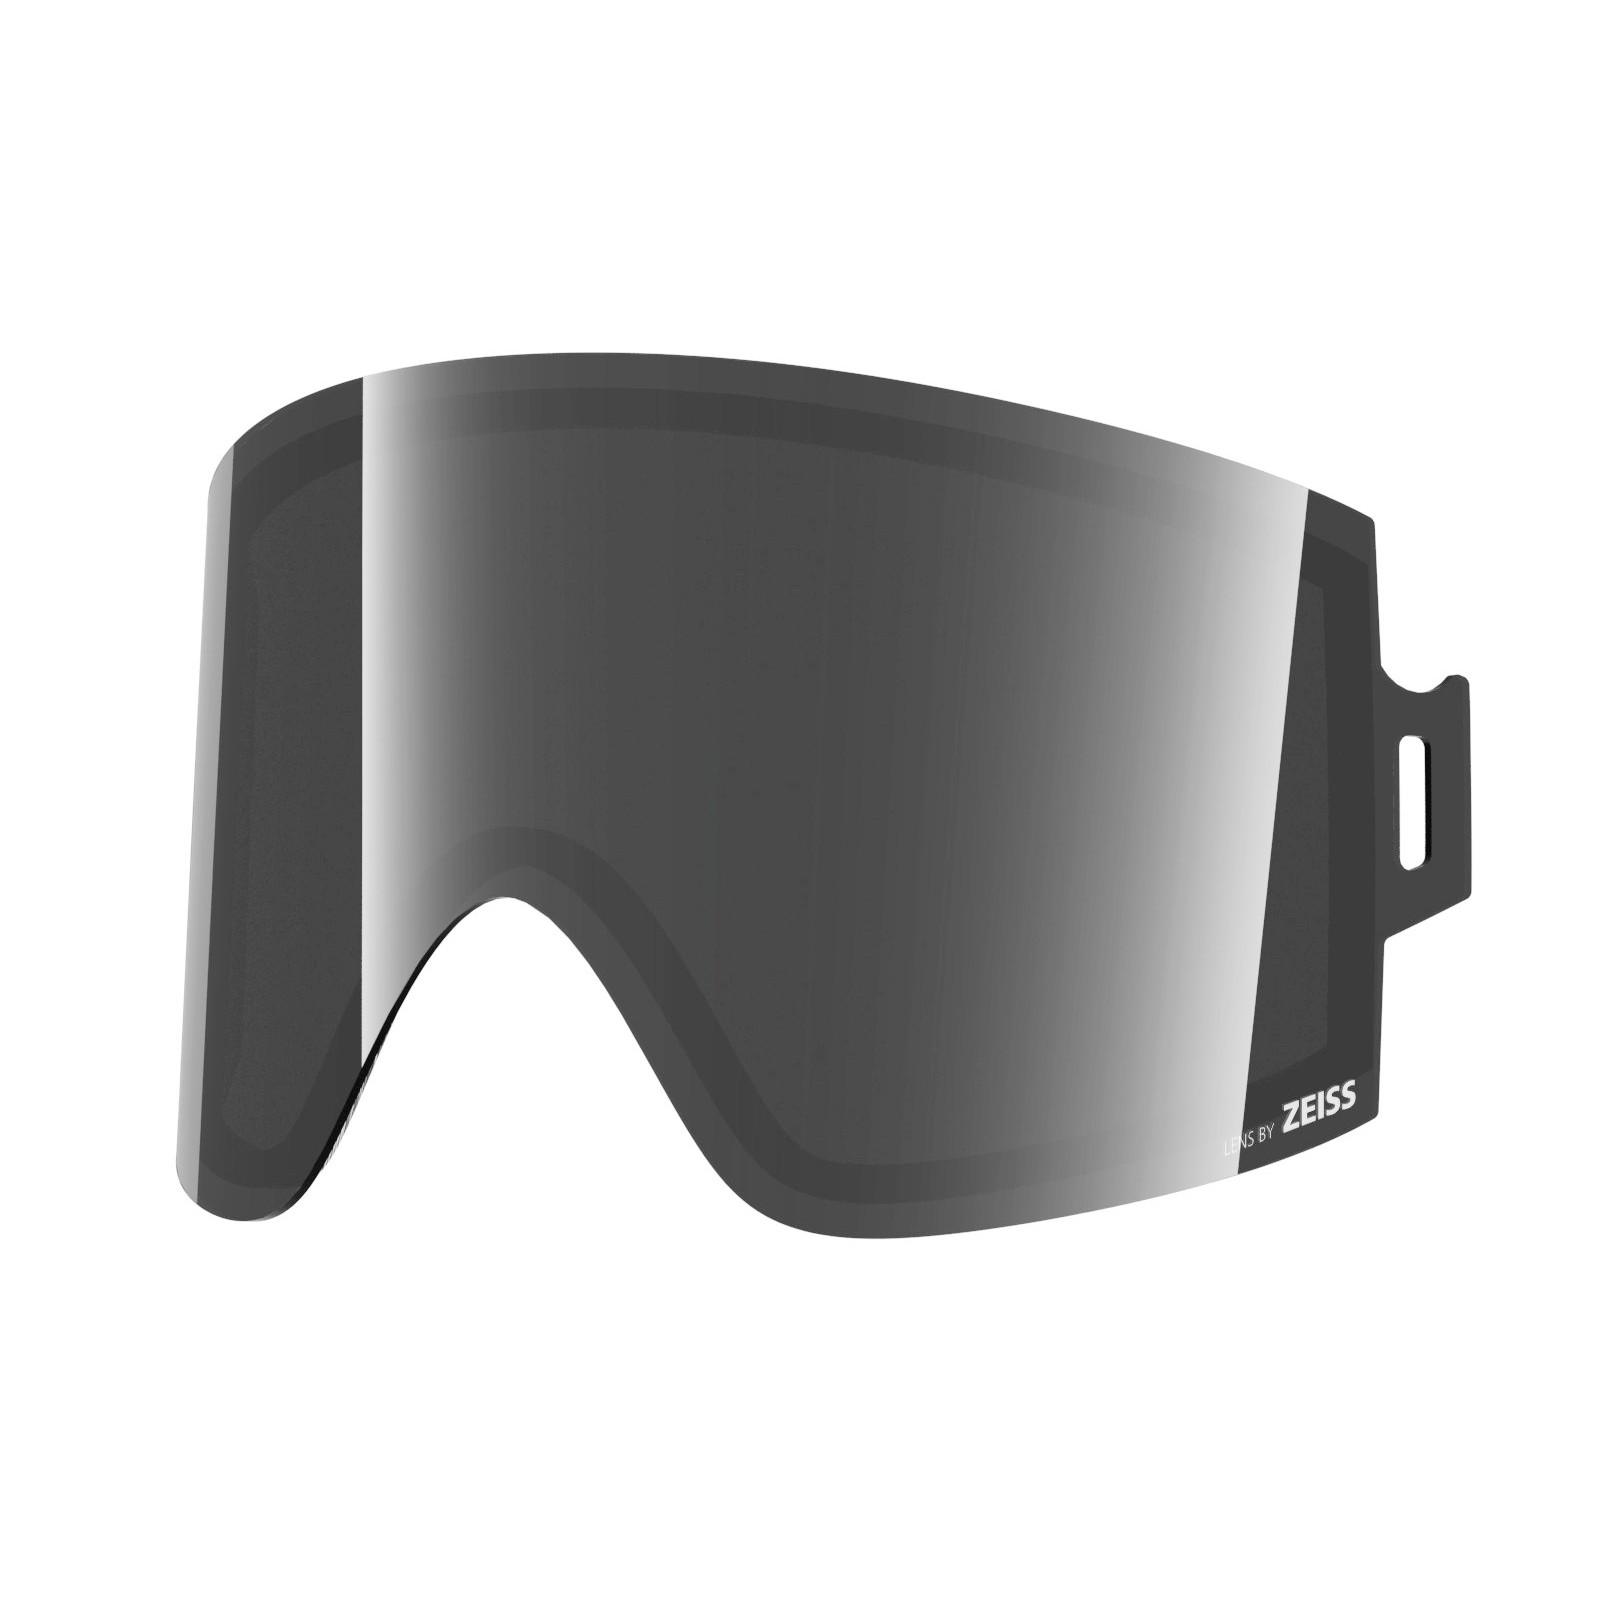 SILVER lens for  Katana goggle